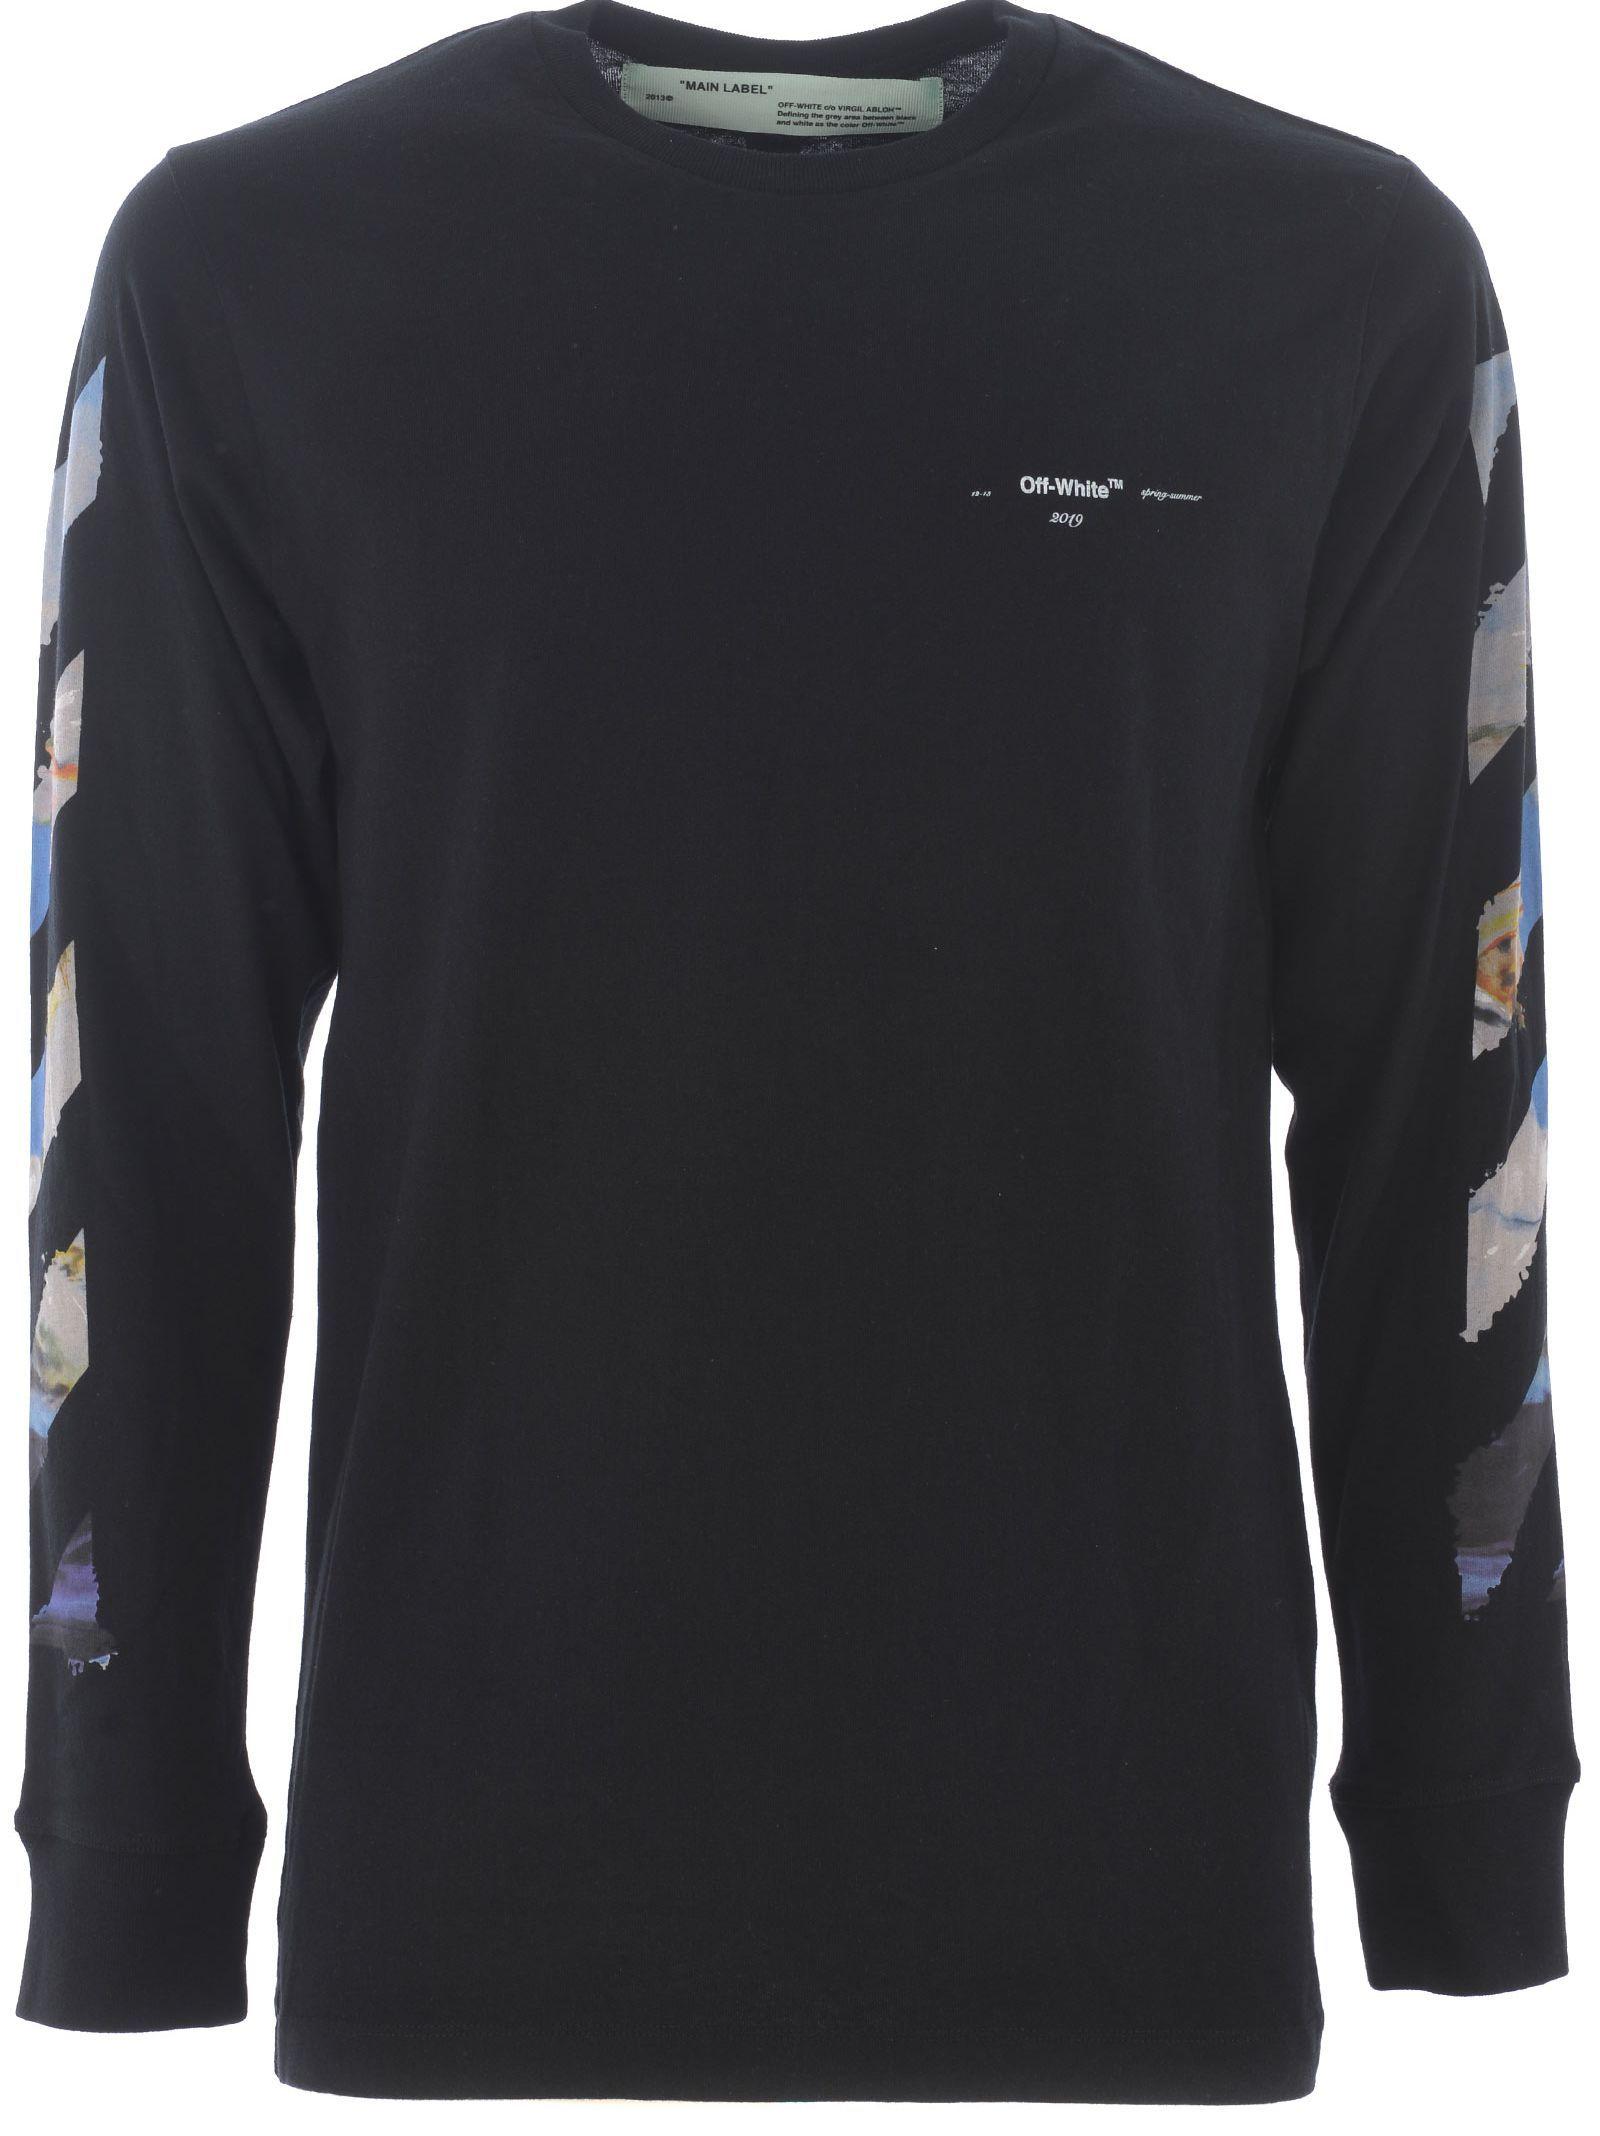 Off White Diag Arrow L S Sweatshirt Long Sleeve Tshirt Men Sweatshirts Off White [ 2136 x 1600 Pixel ]